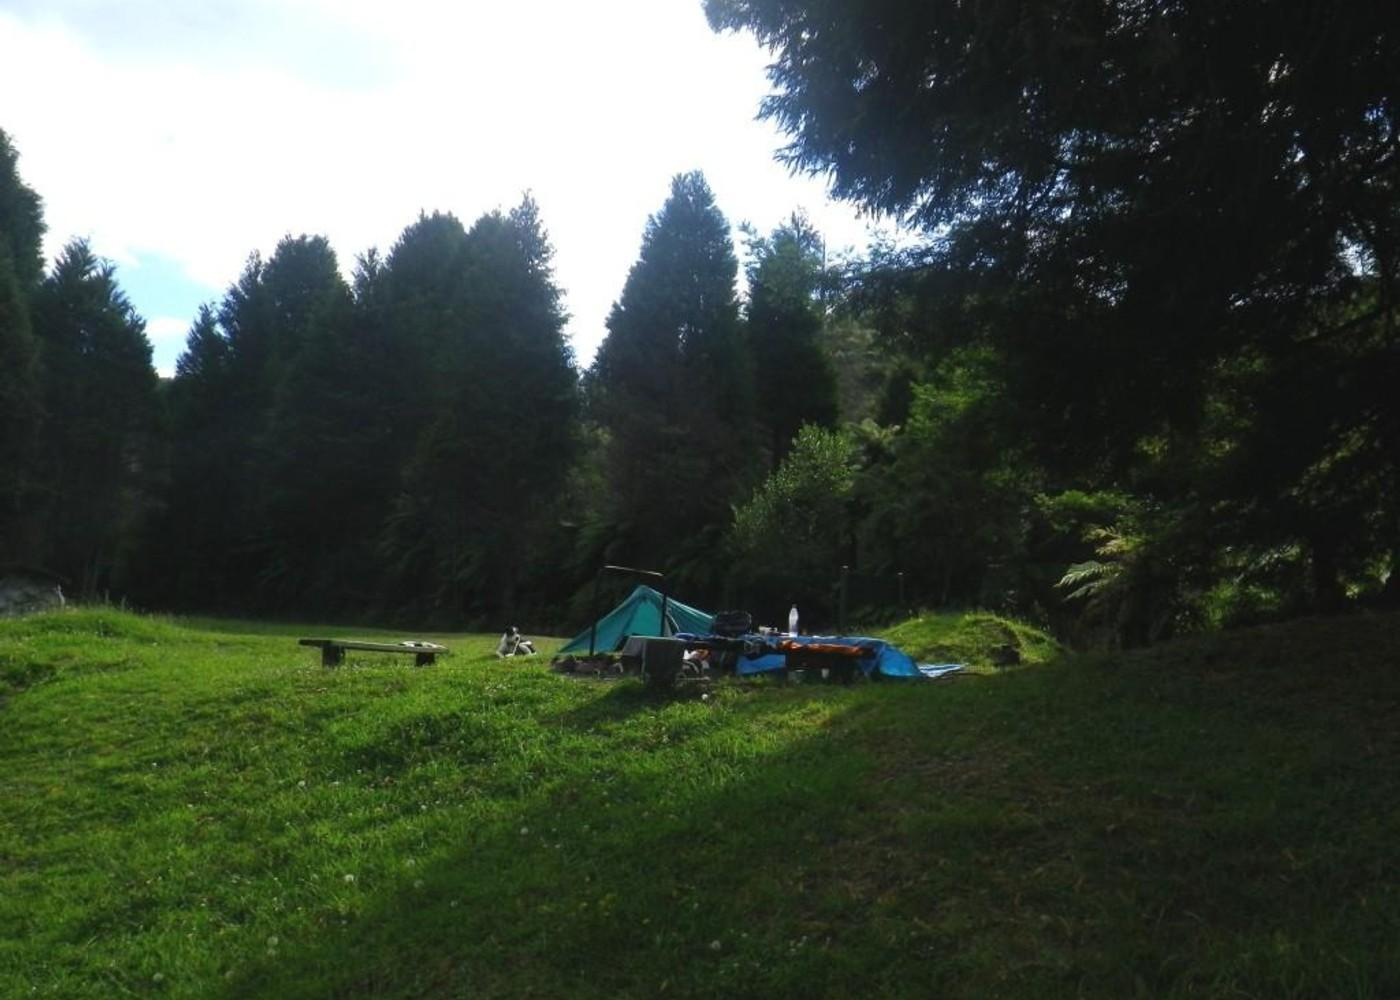 Whitikau Campsite